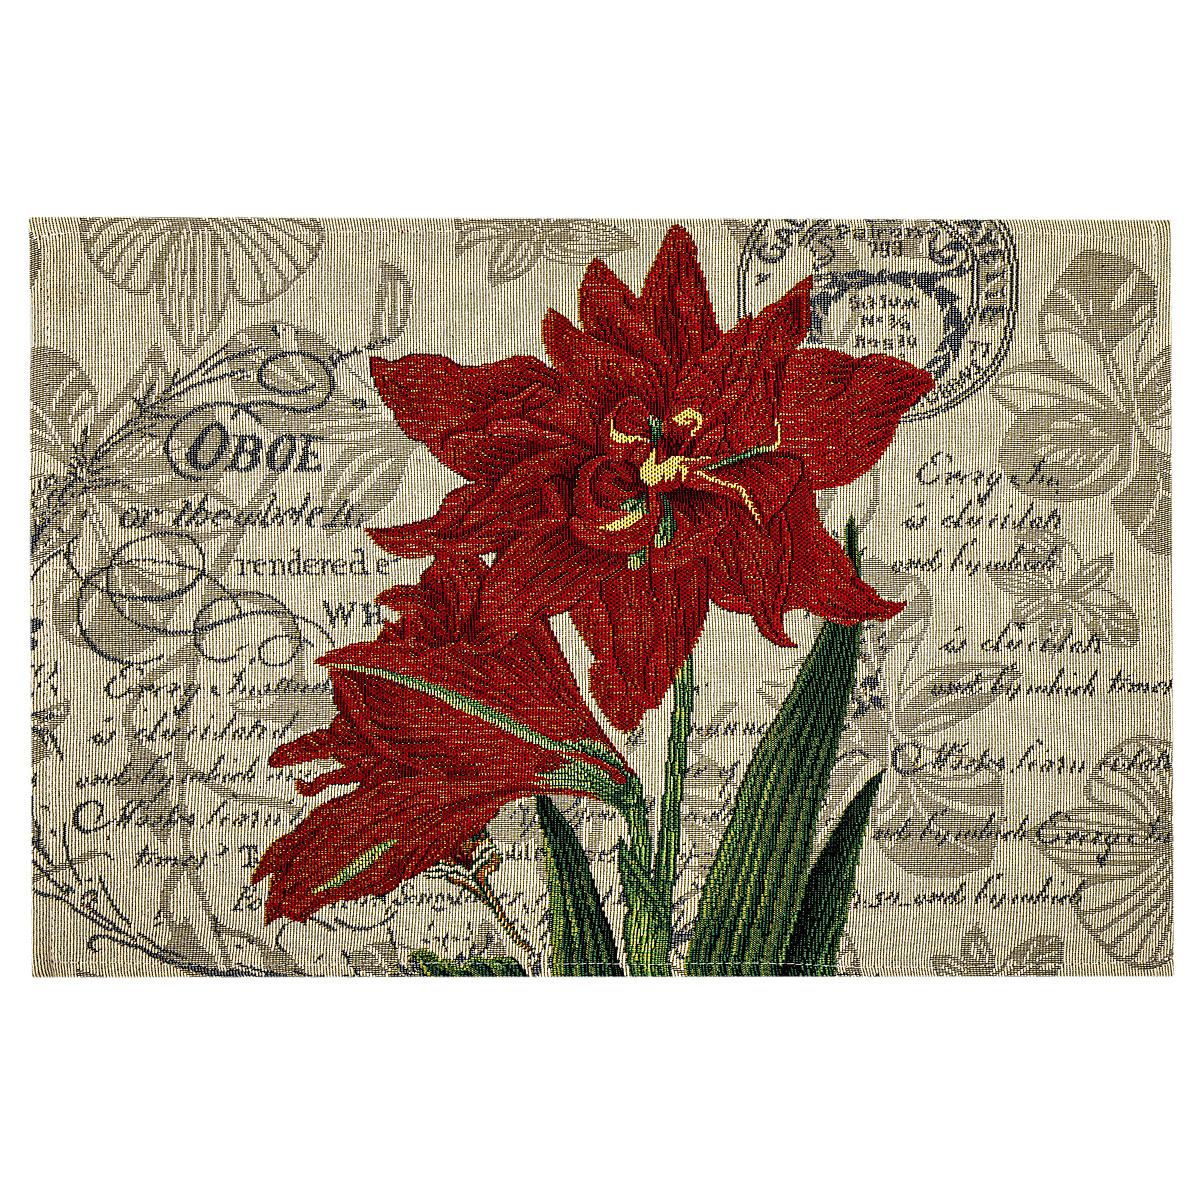 Poza Napron Crin rosu, 32 x 48 cm